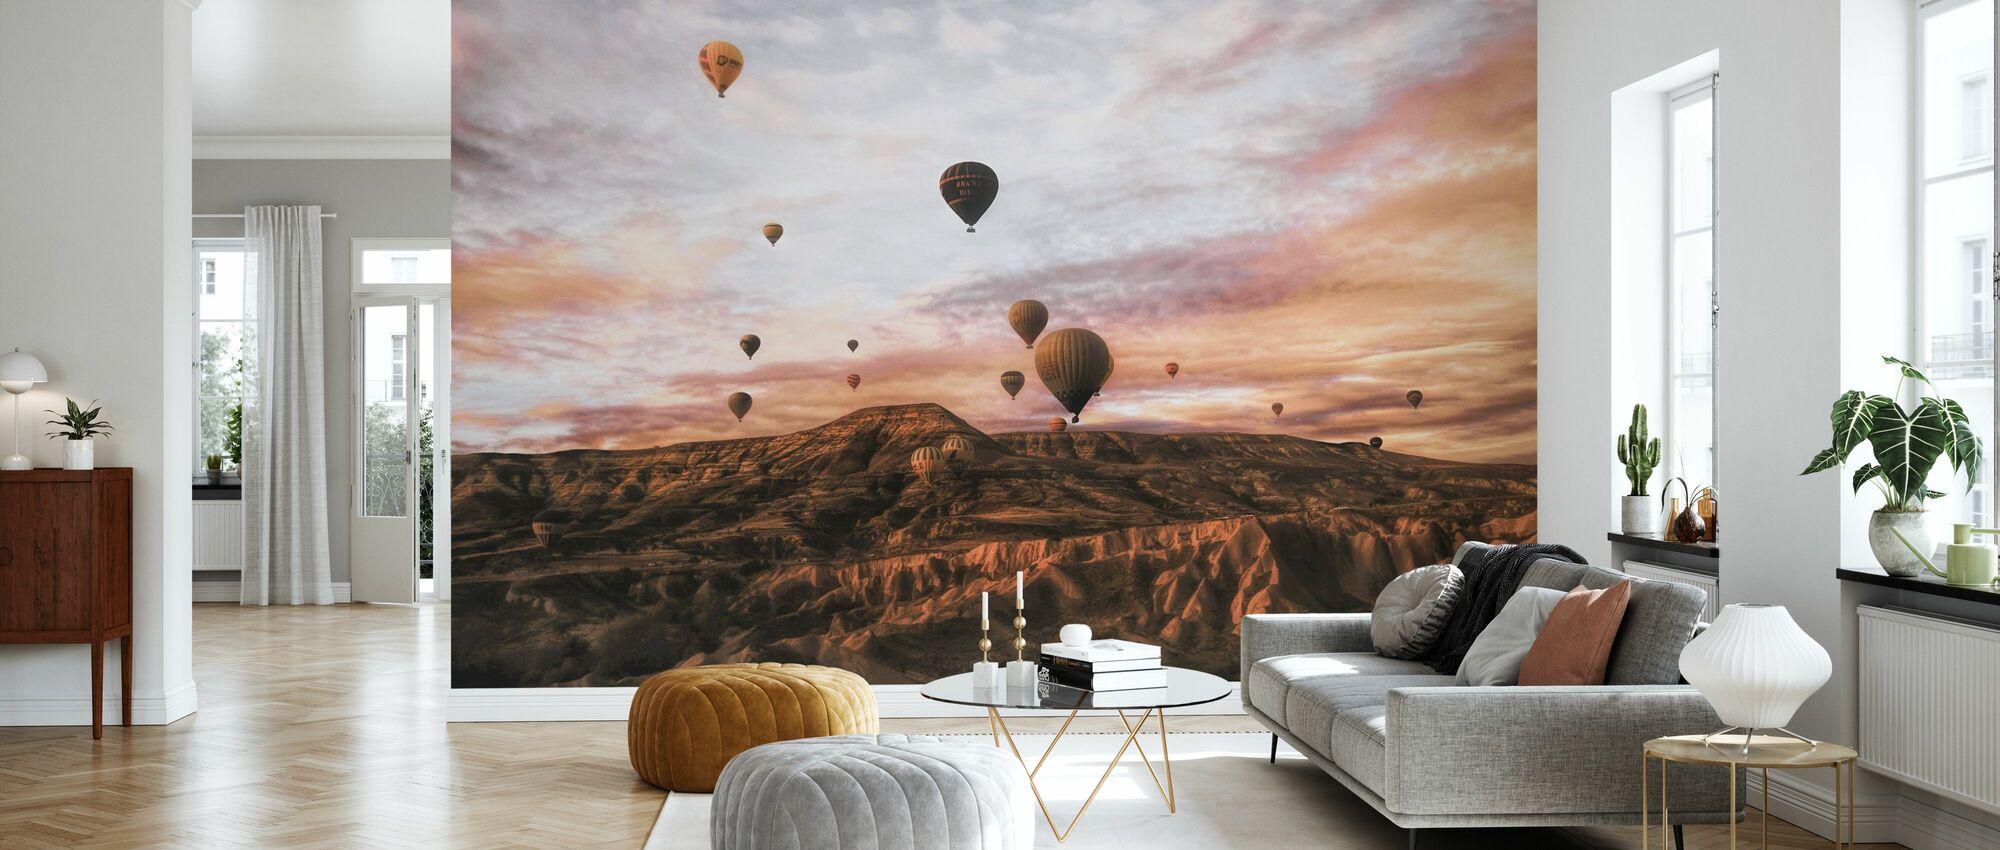 Cappodocia Hot Air Balloon - Wallpaper - Living Room